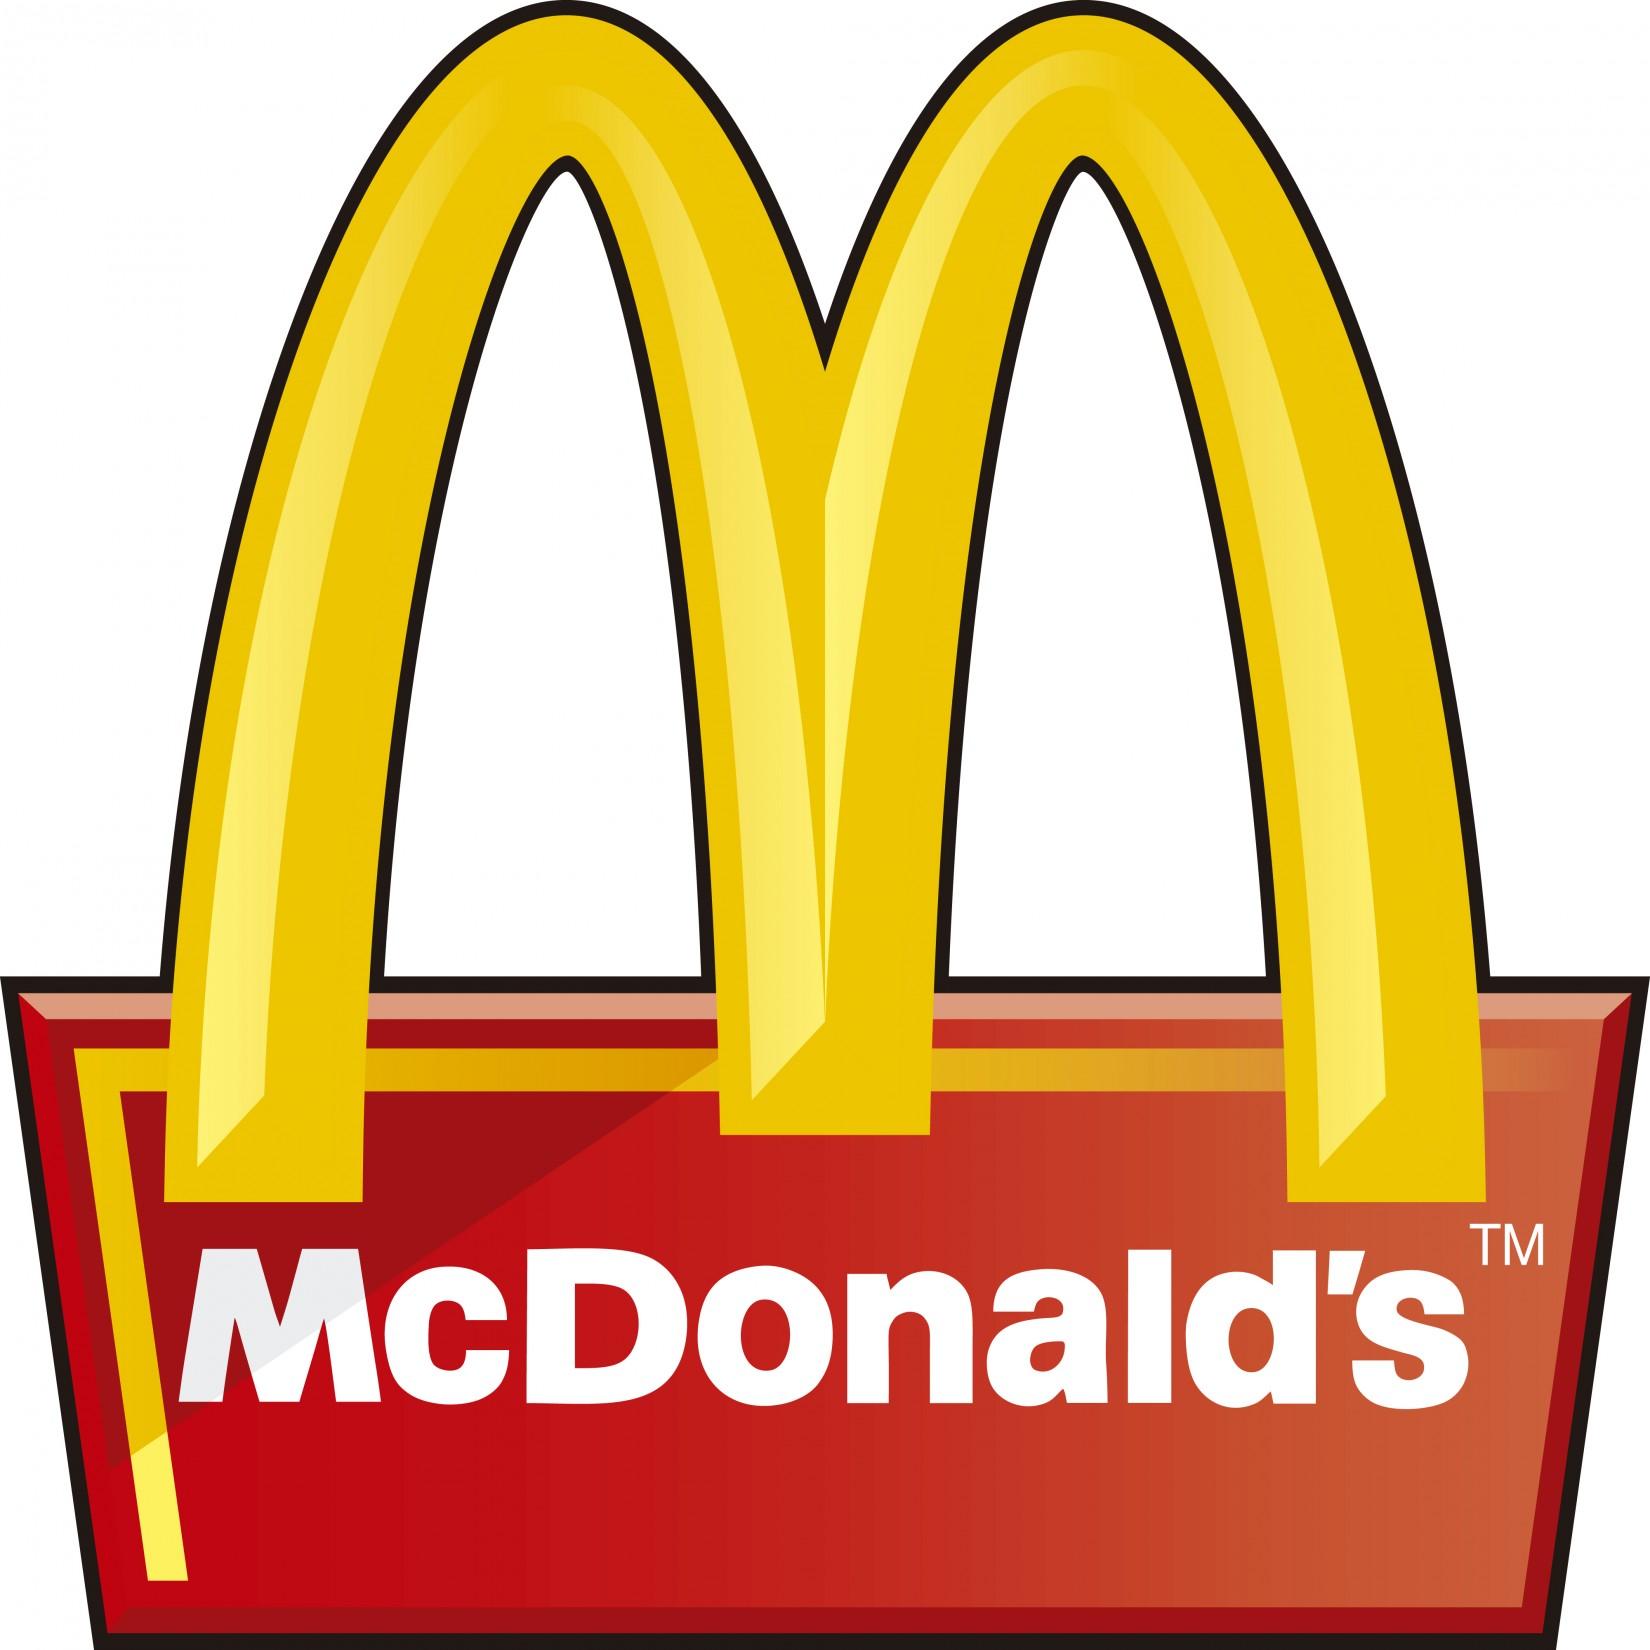 mcdonalds factors of production nz